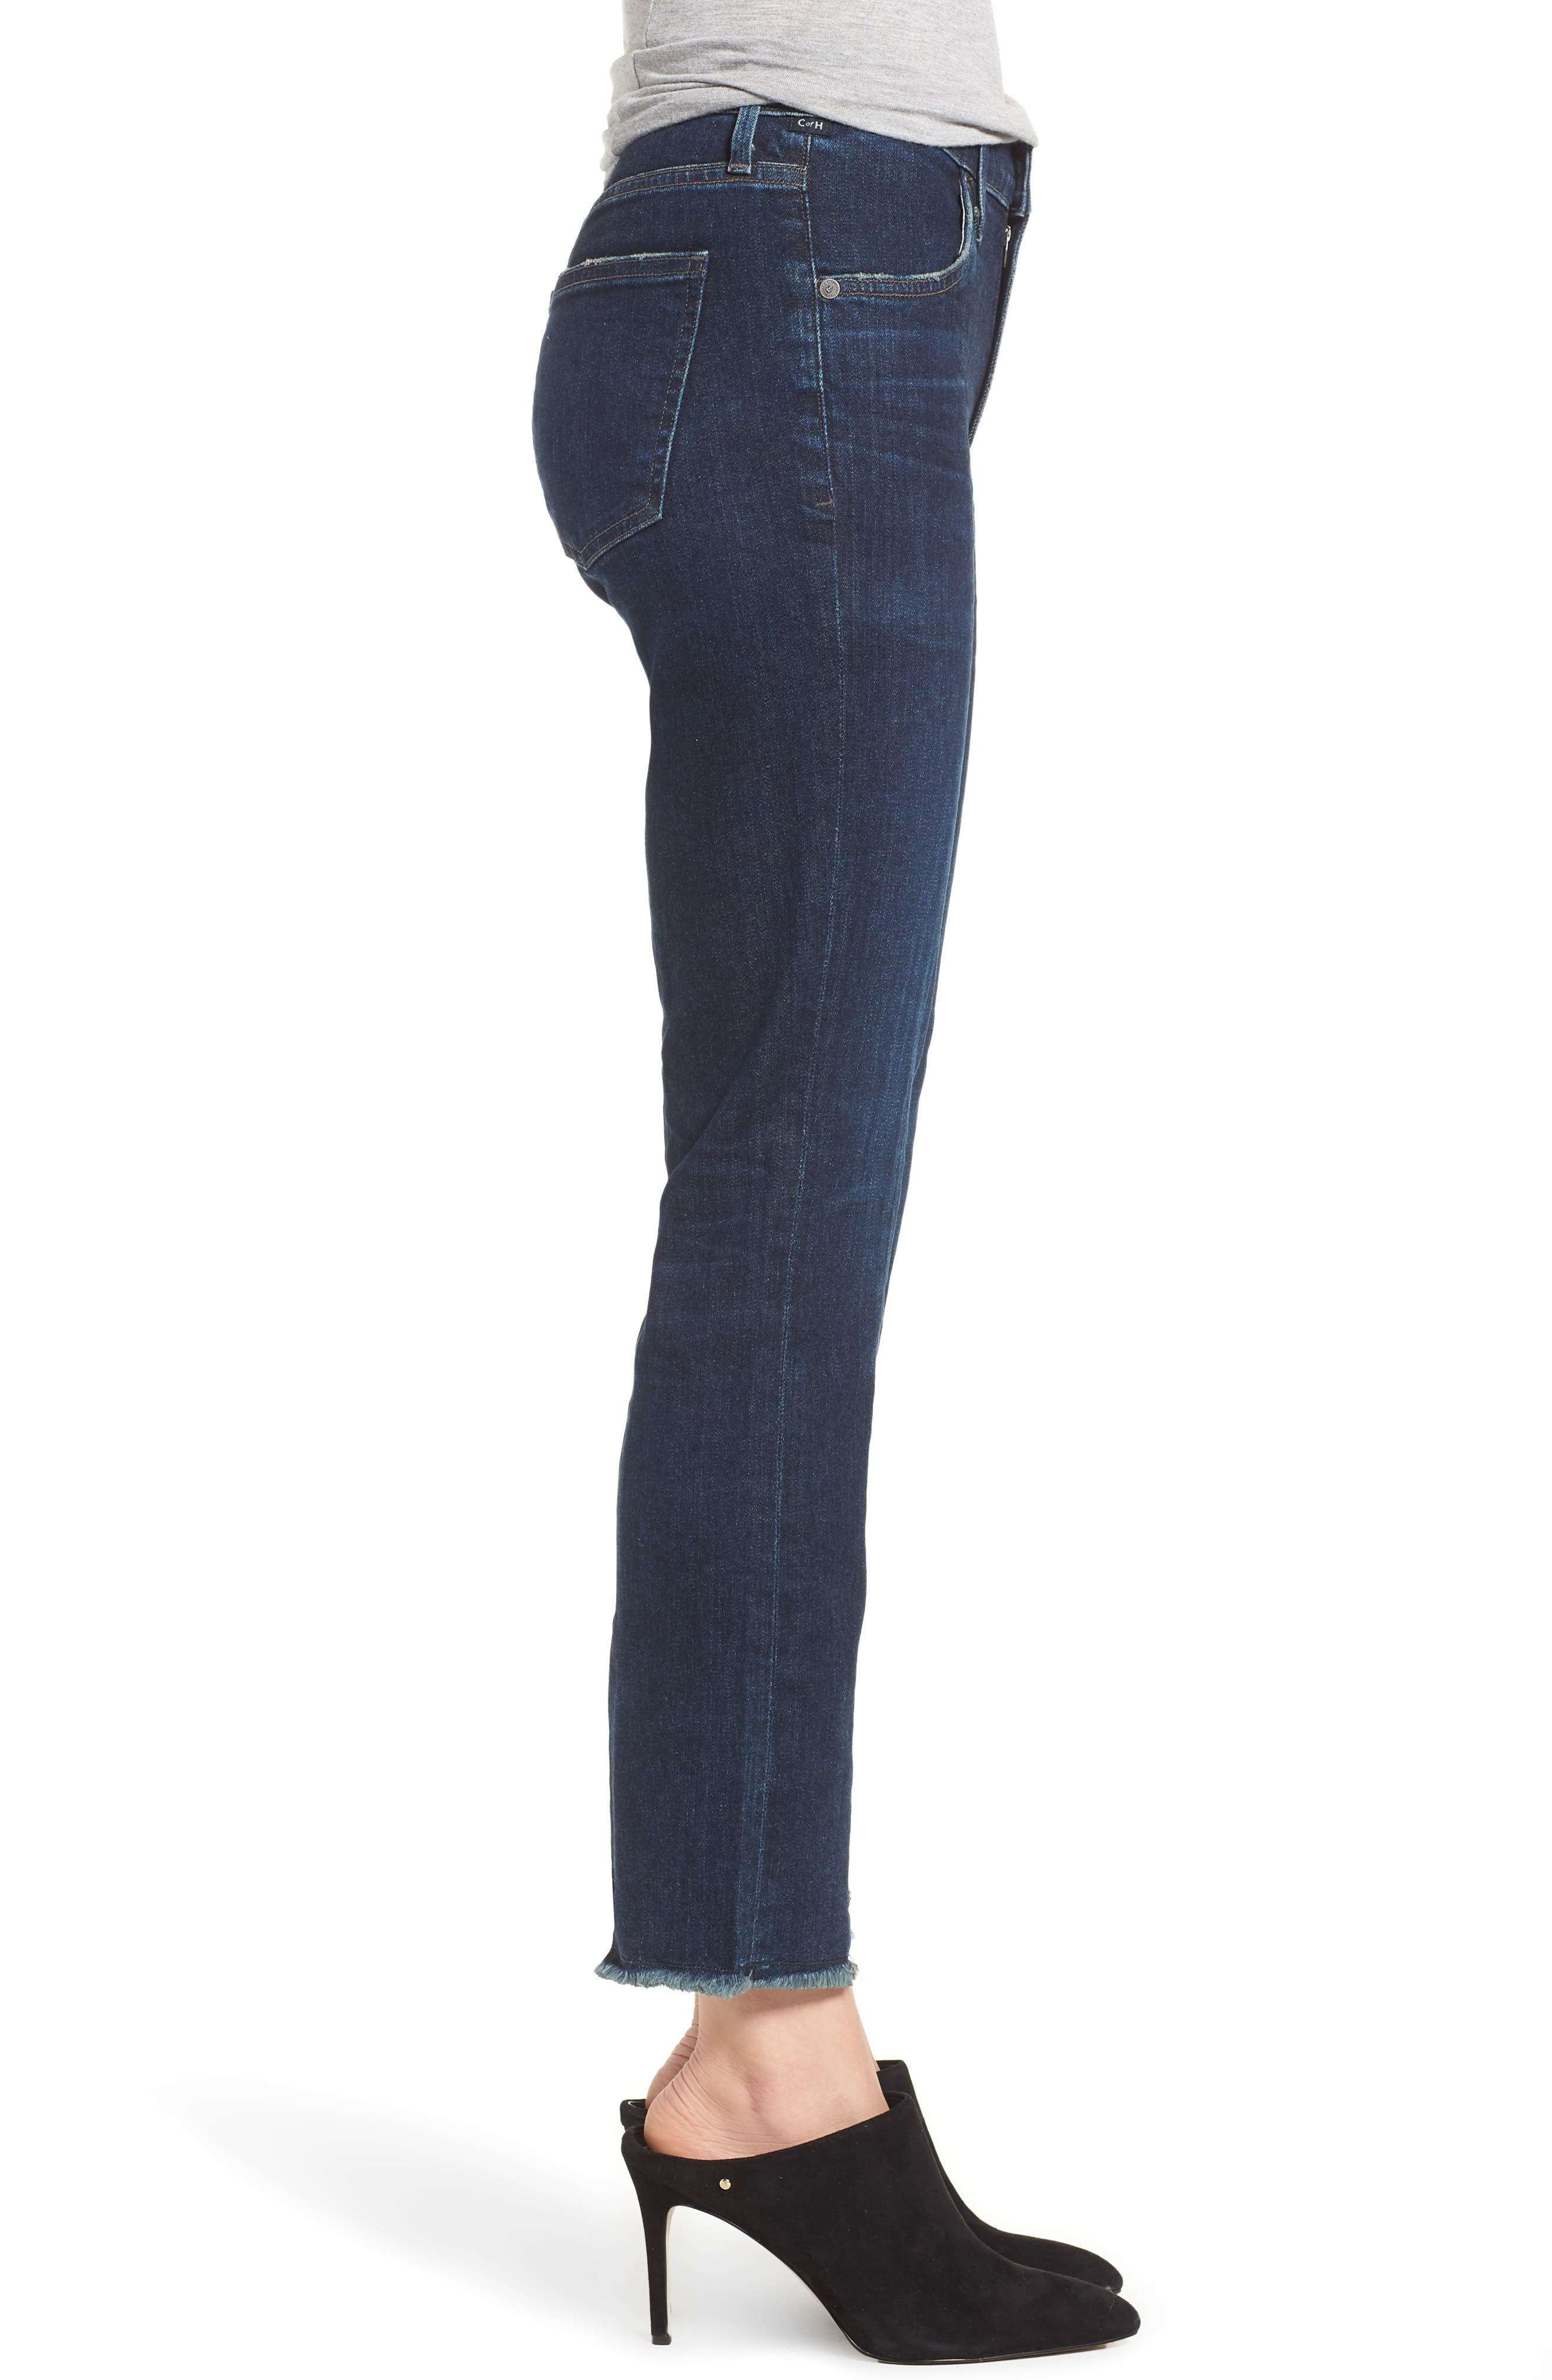 Amari Ankle Skinny Jeans,                             Alternate thumbnail 3, color,                             401